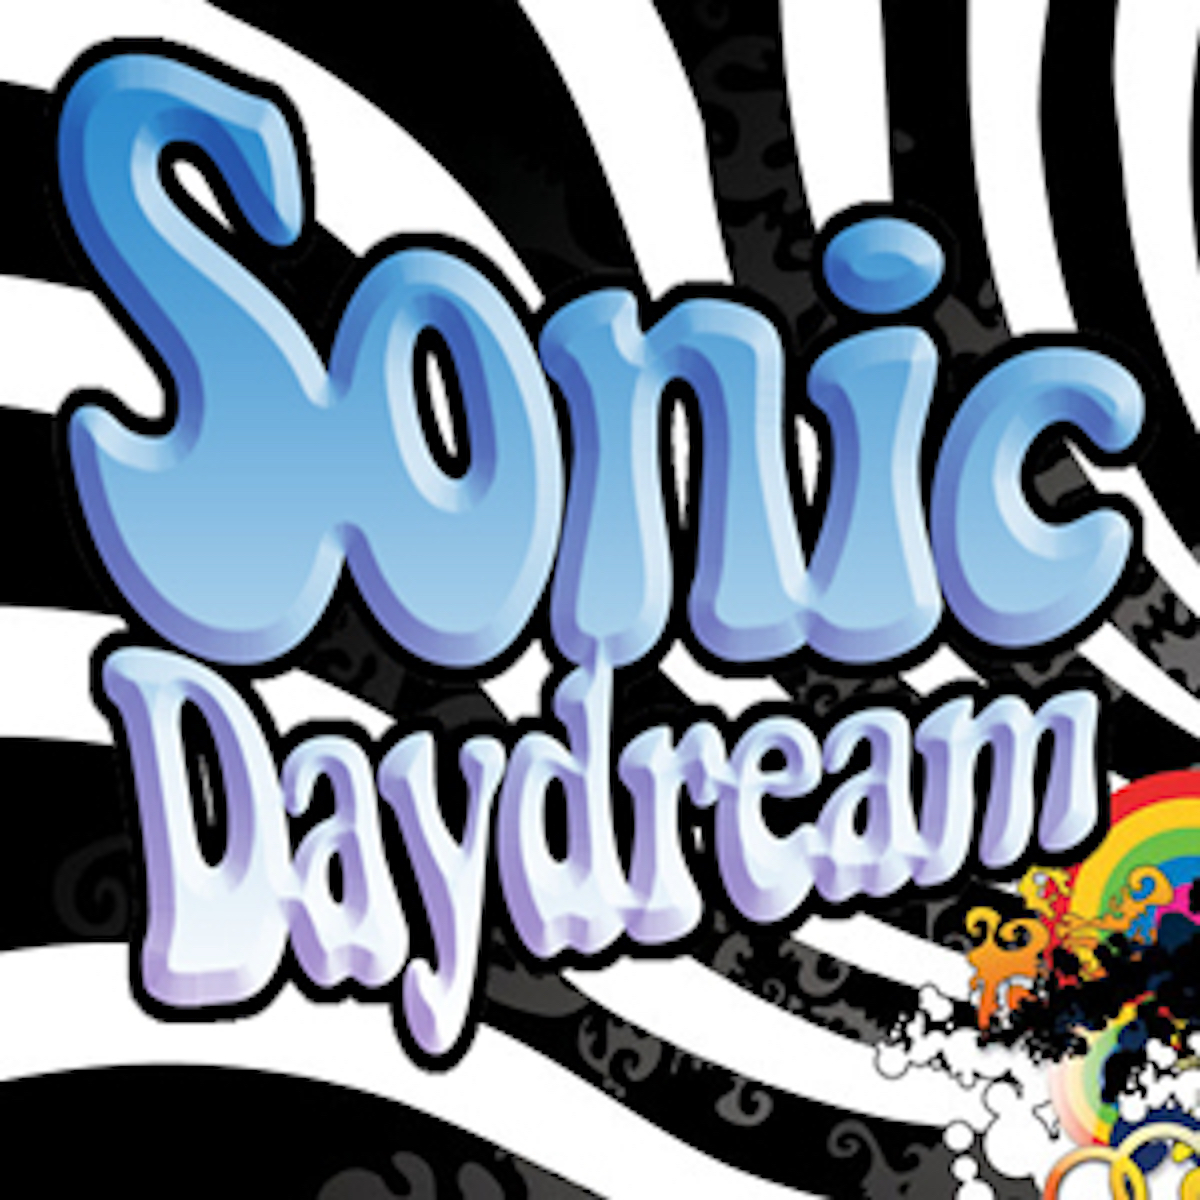 Sonic Daydream show art